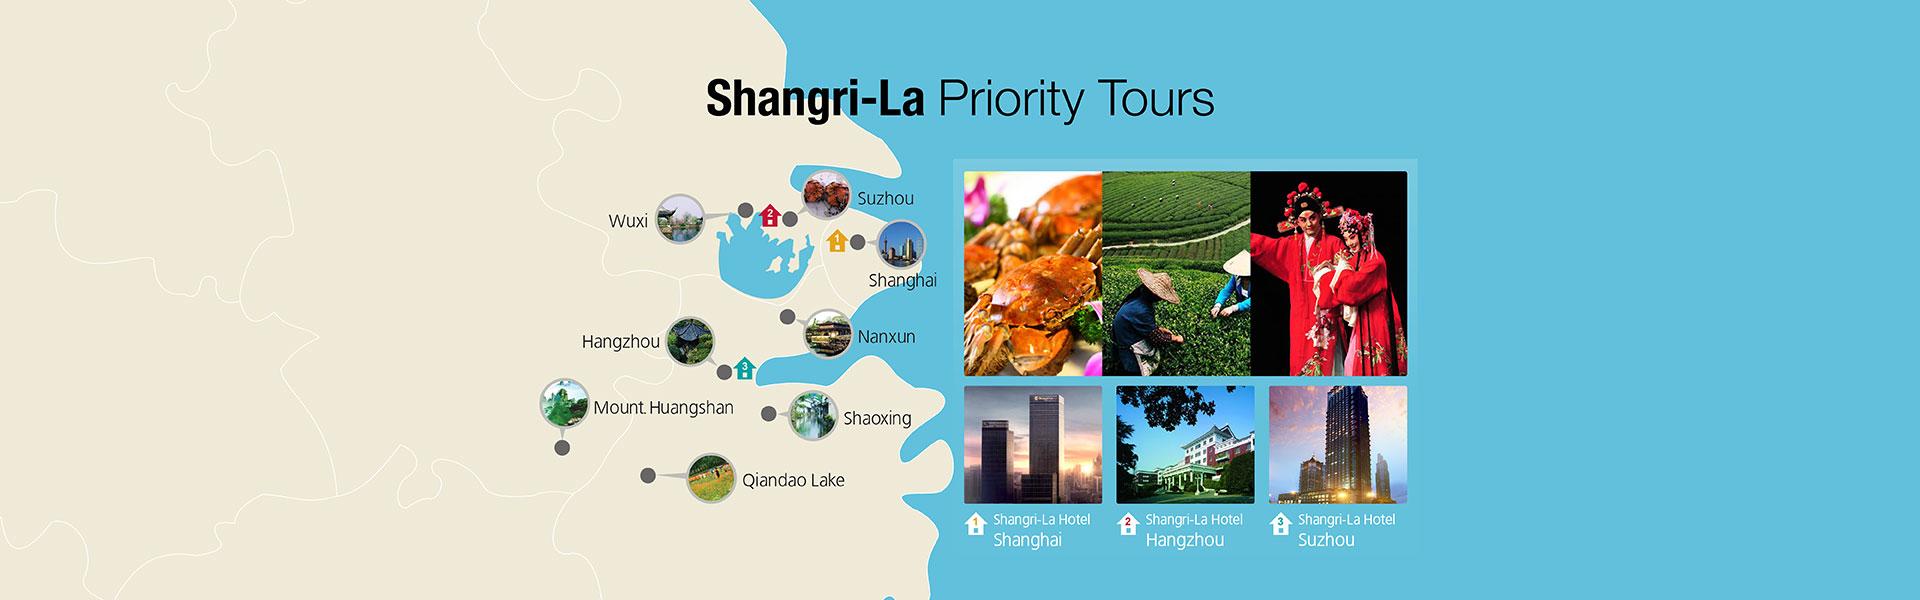 Shangri-La Priority Tours